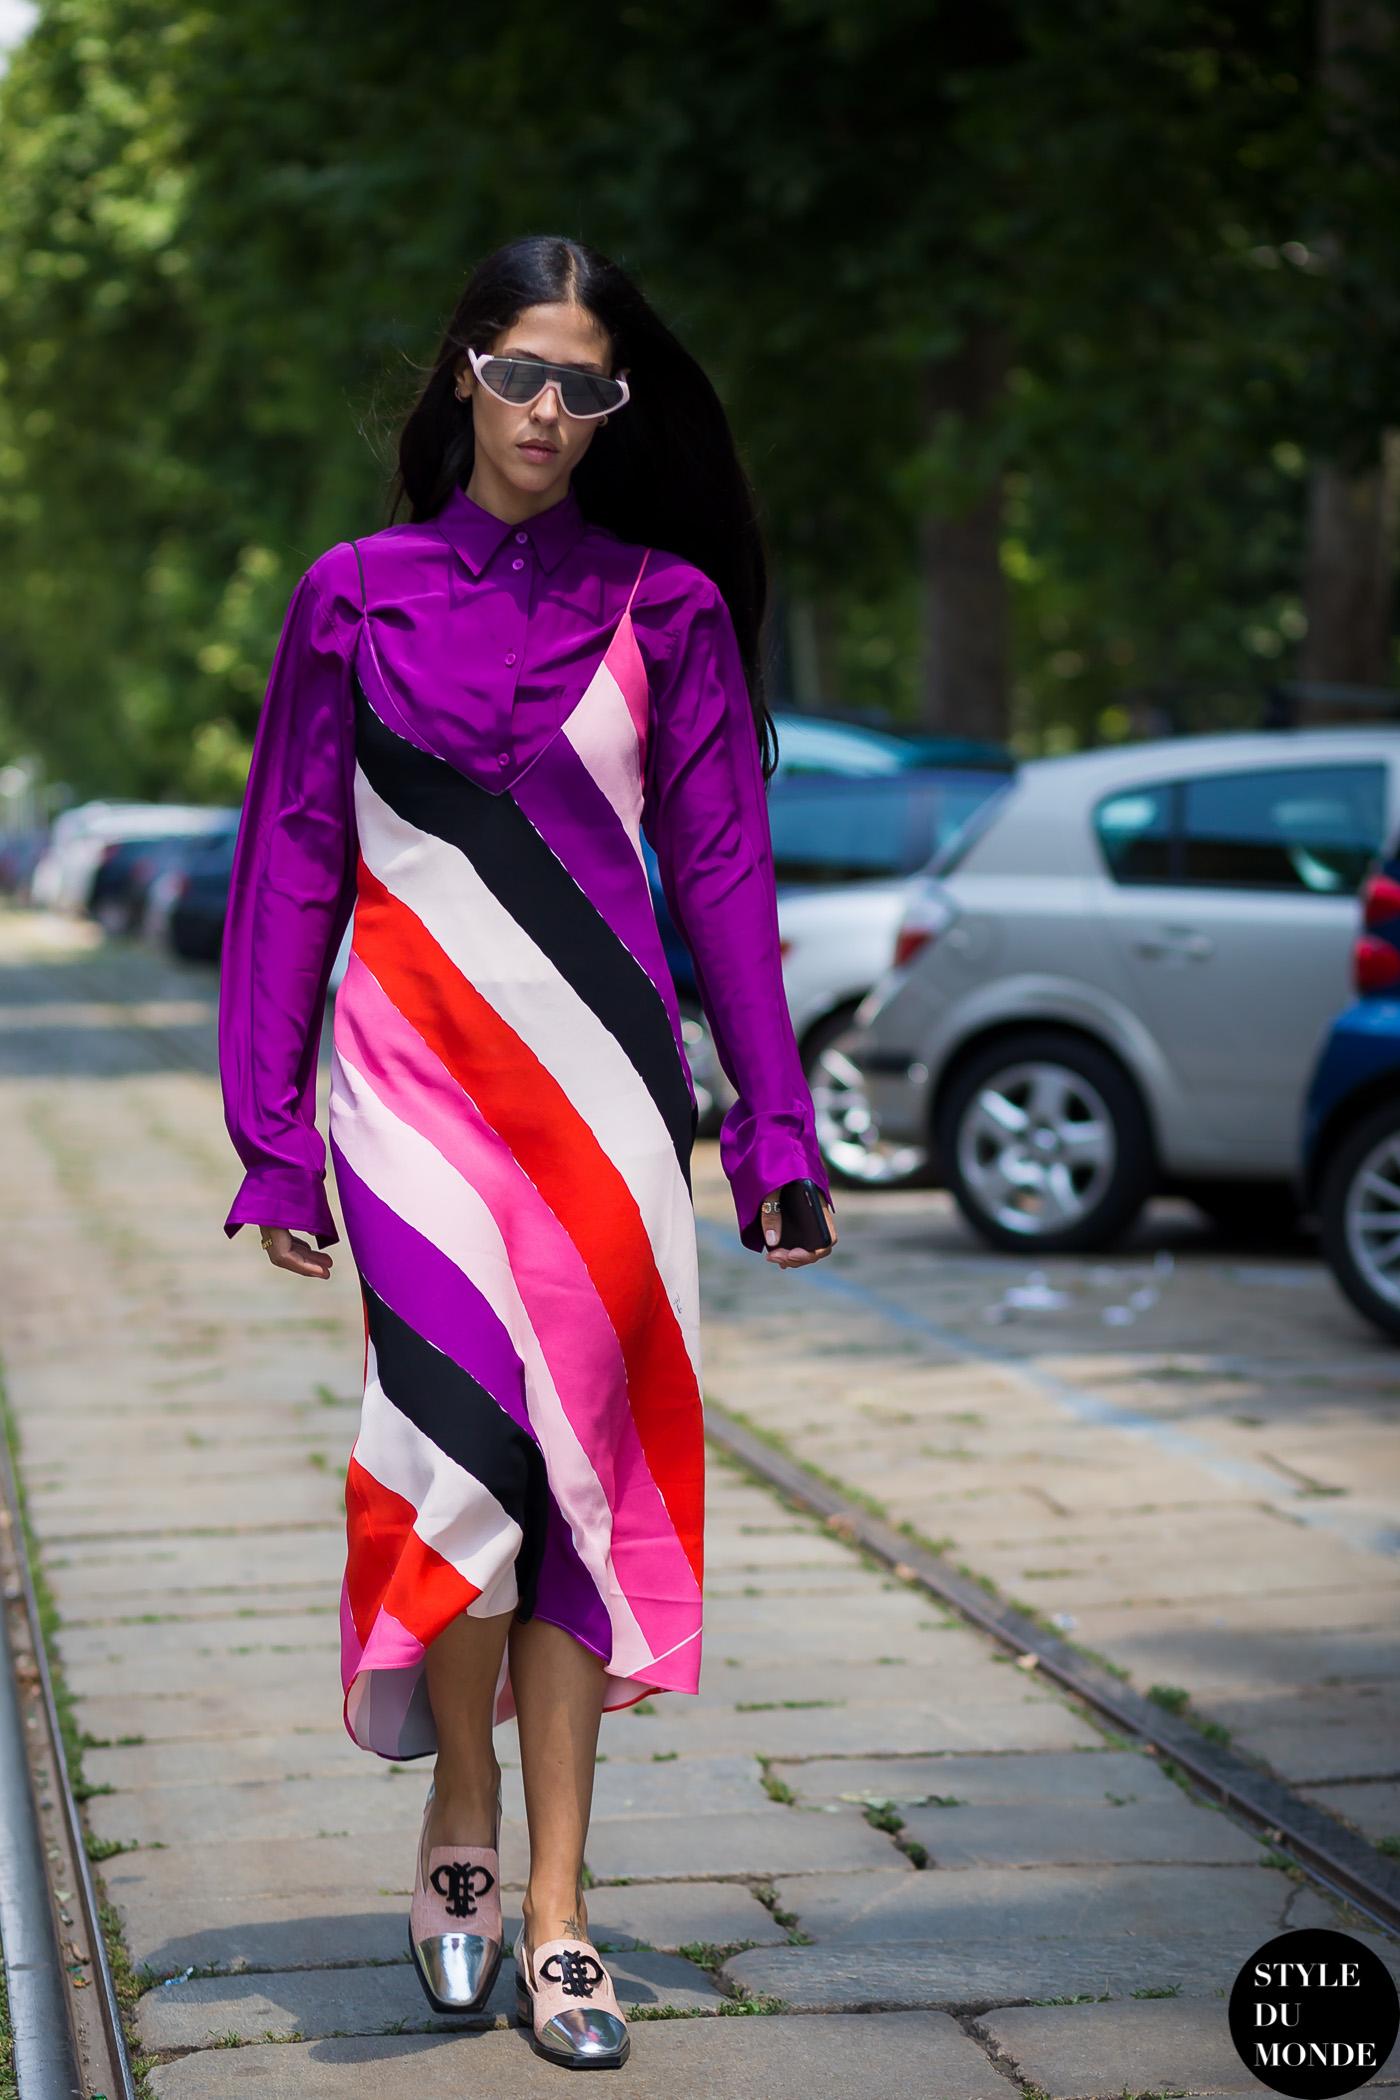 Emilio Pucci Striped Dress Style Du